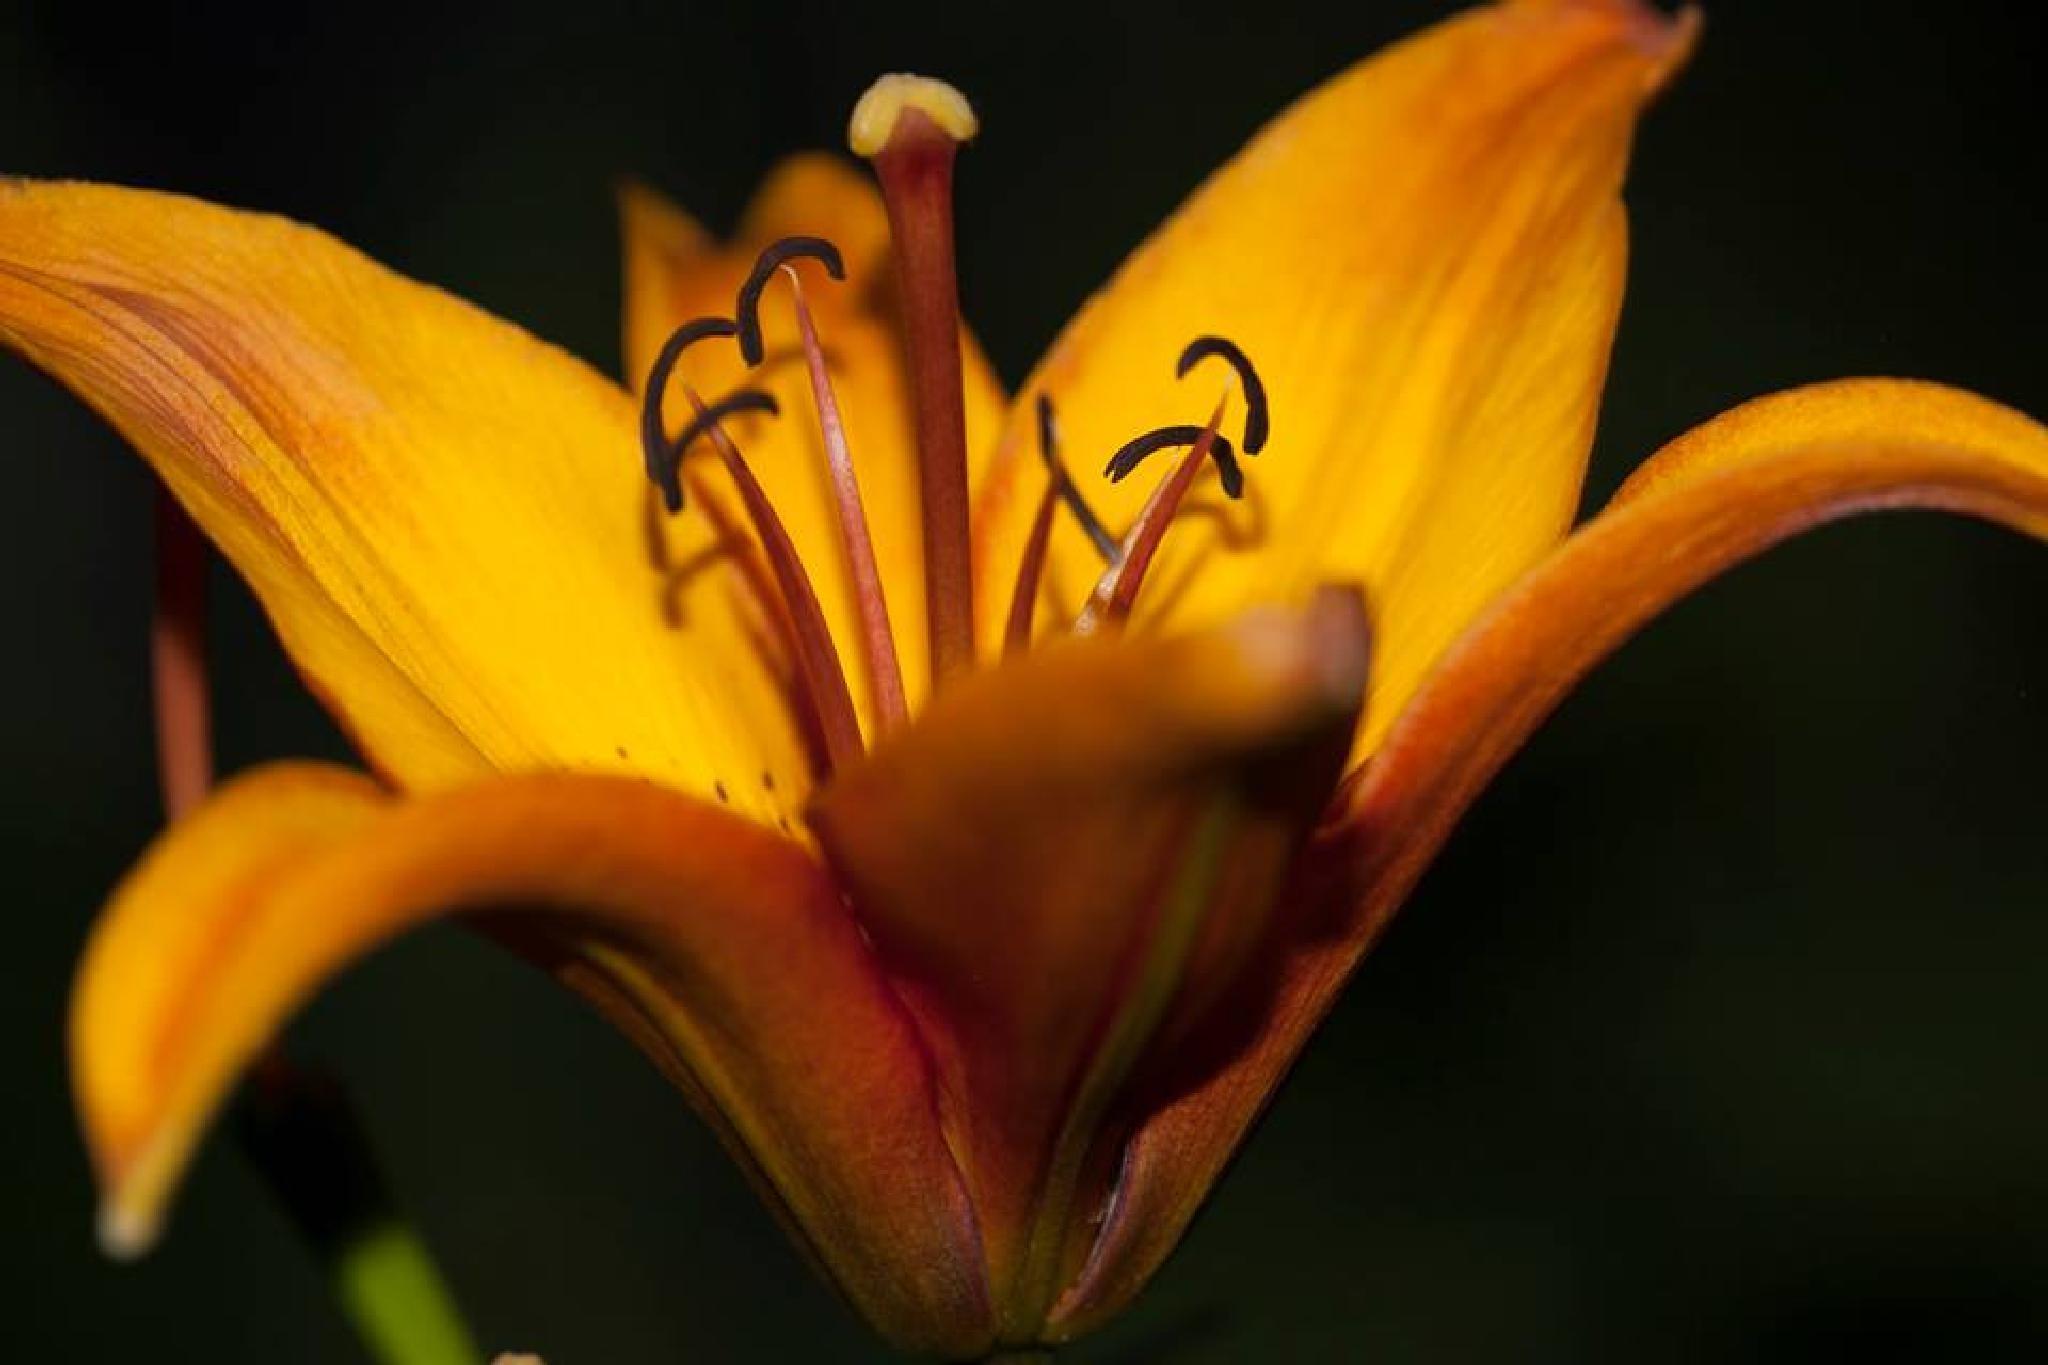 Flower in Bloom by Angeline Shepard